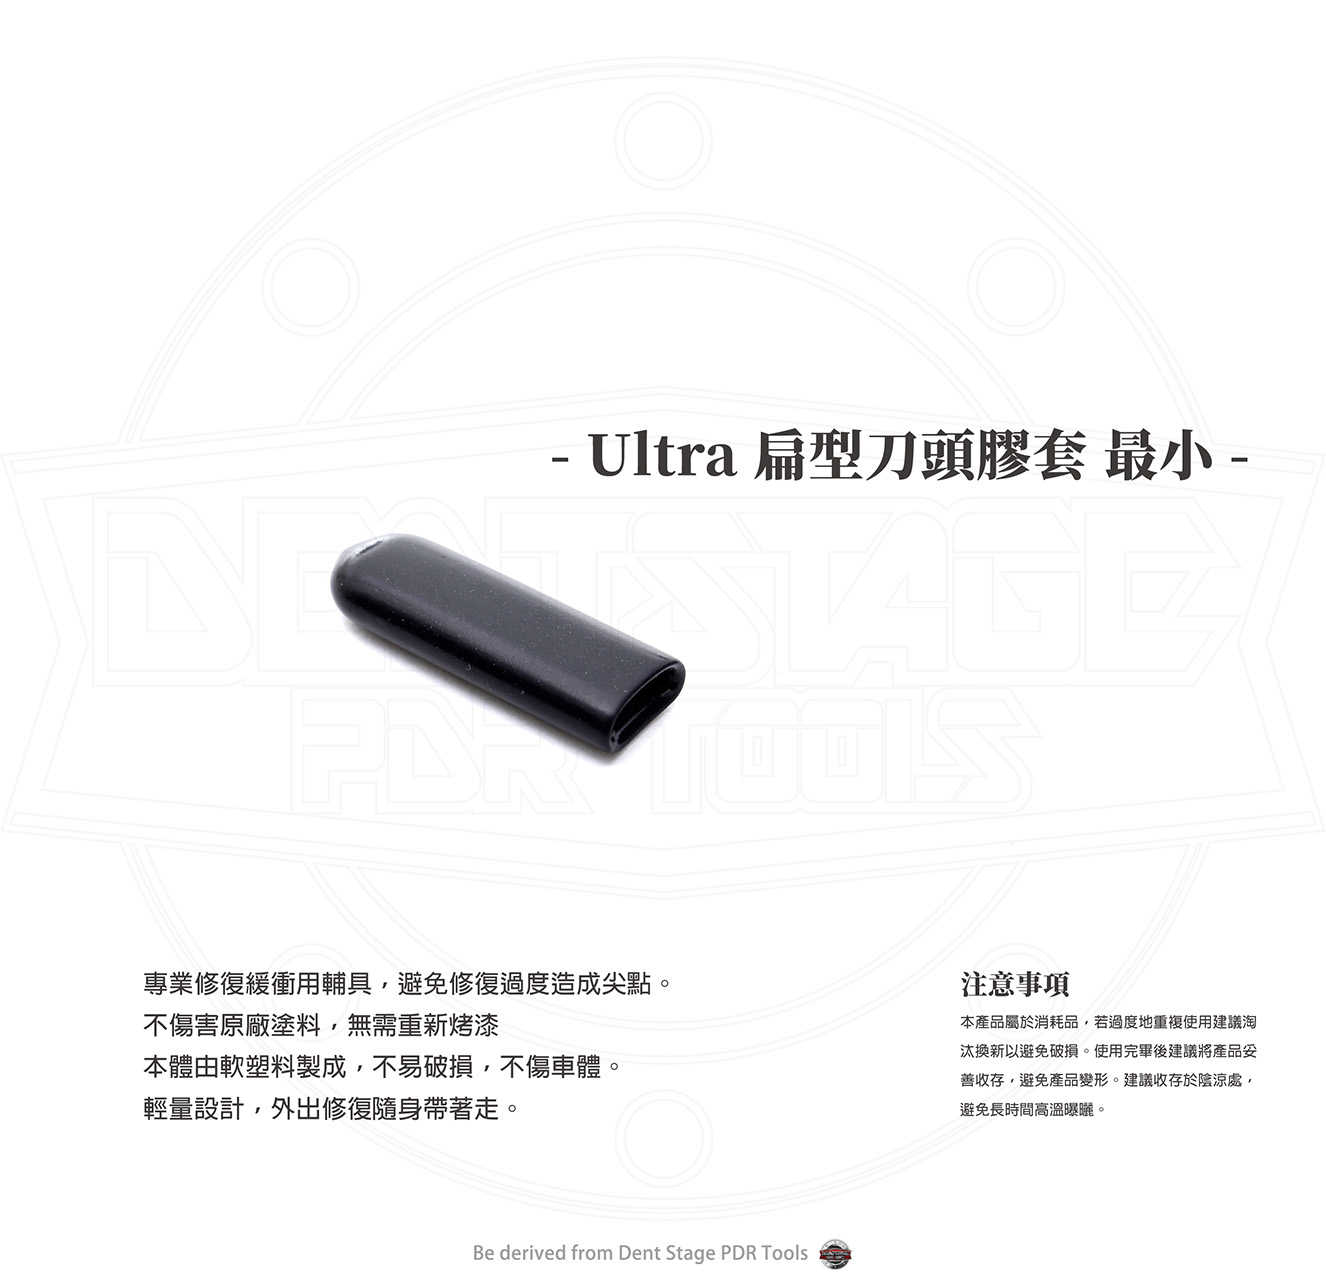 Ultra 扁型刀頭膠套 - 最小_02.jpg